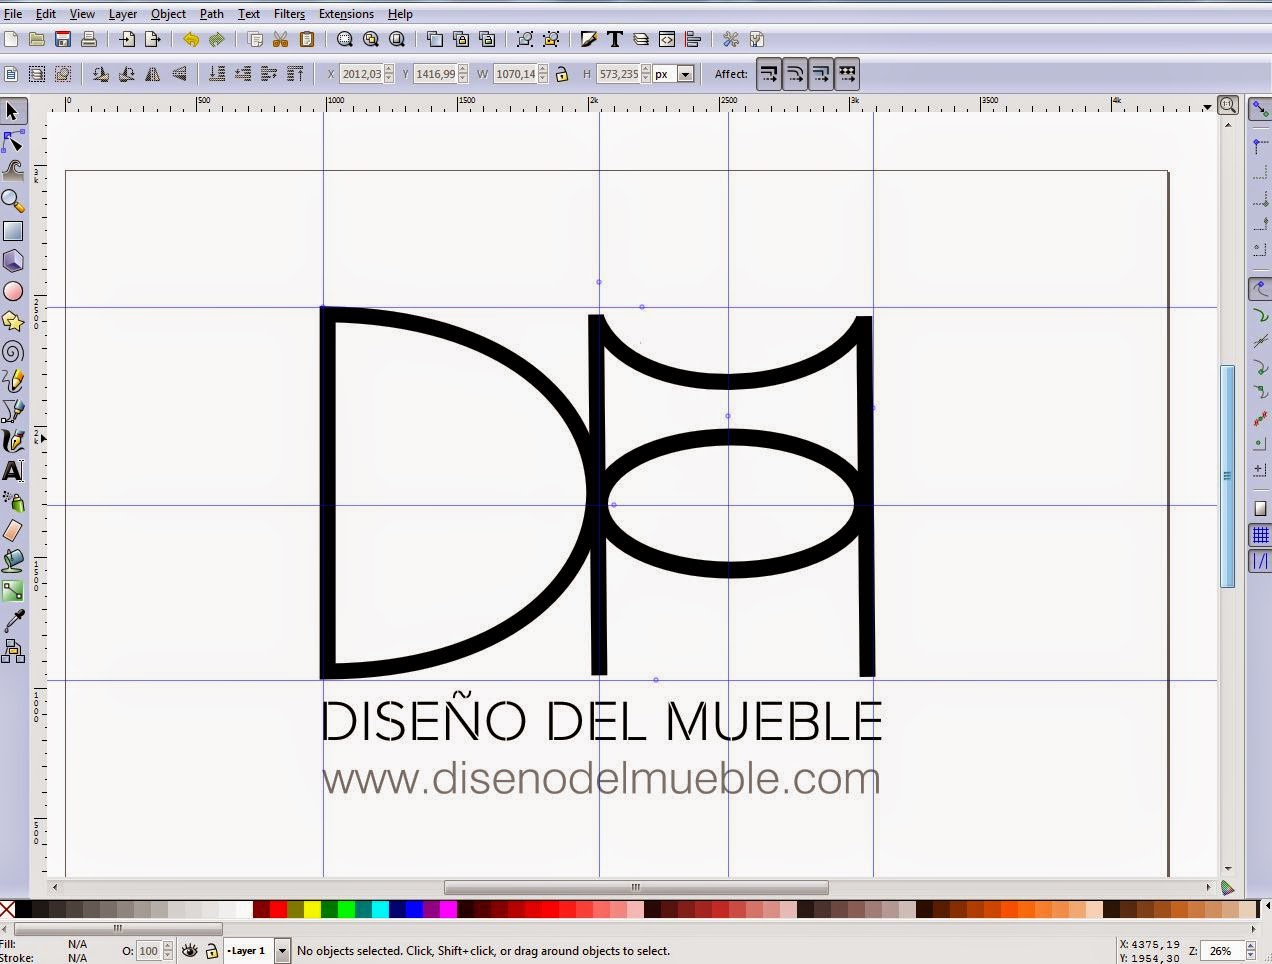 Jorge monta a caso dise o visual web dise o del mueble for Programa de diseno de muebles en 3d